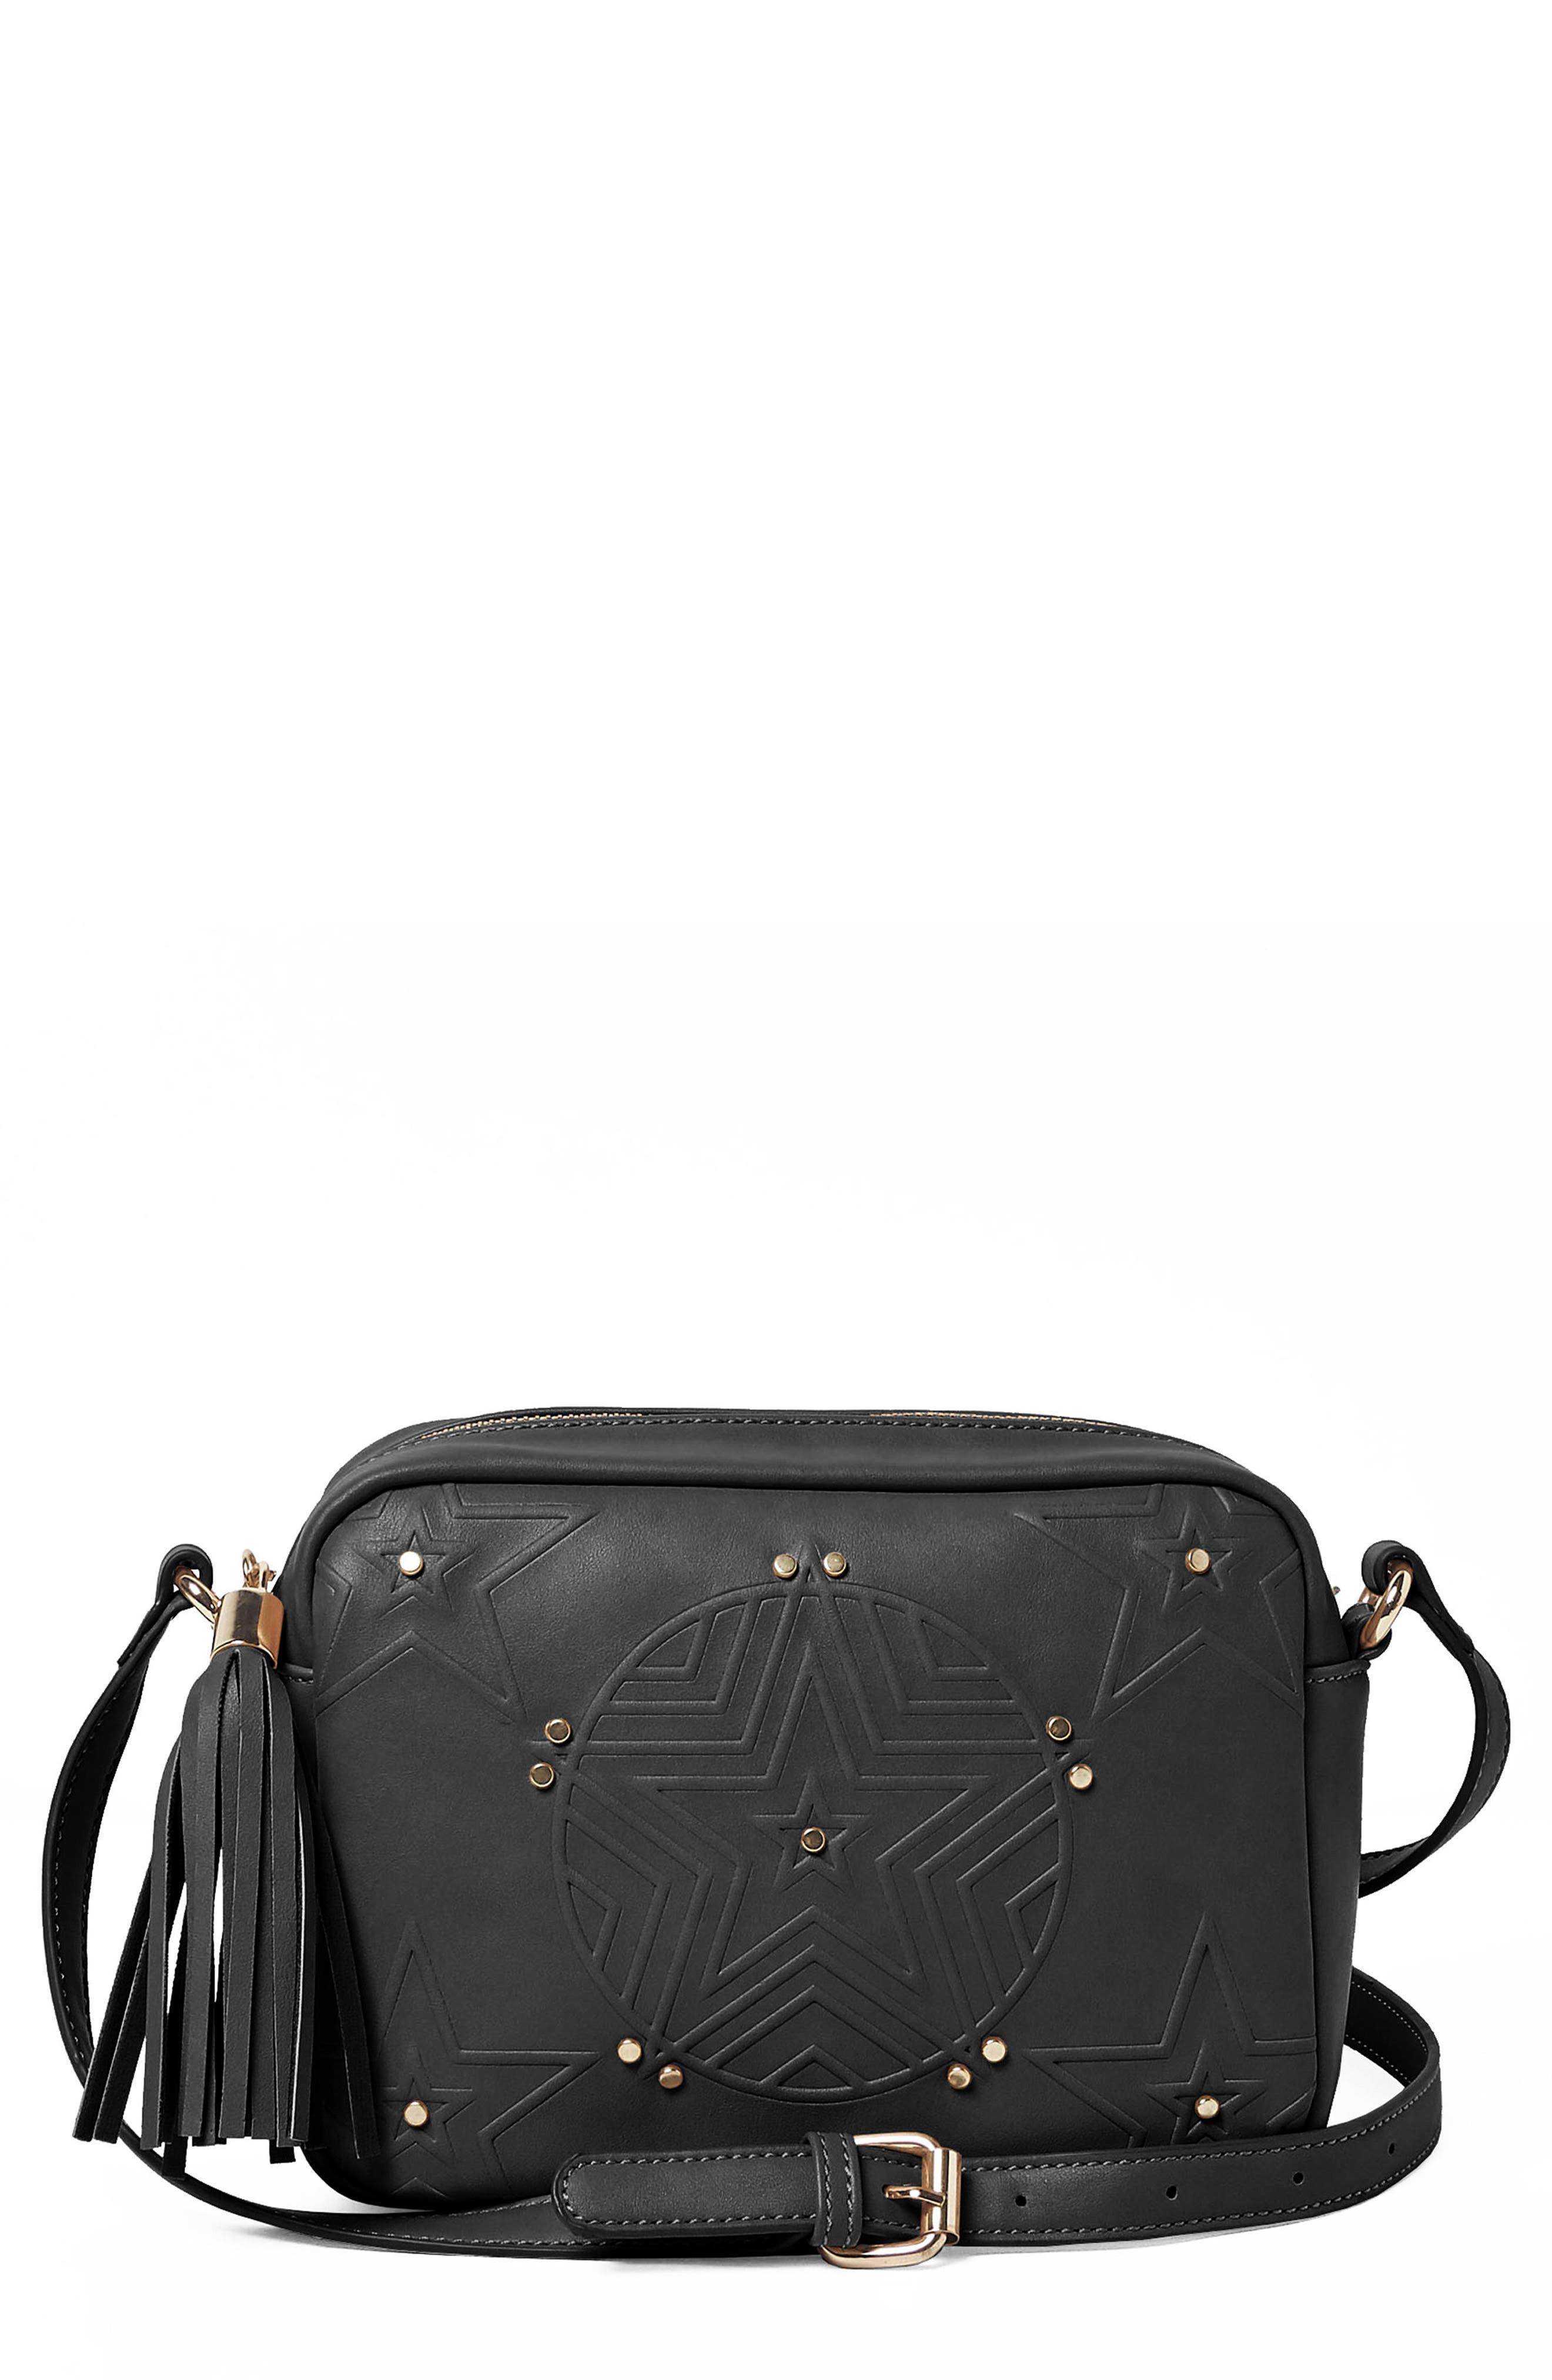 Stargazer Vegan Leather Crossbody Bag,                             Main thumbnail 1, color,                             001